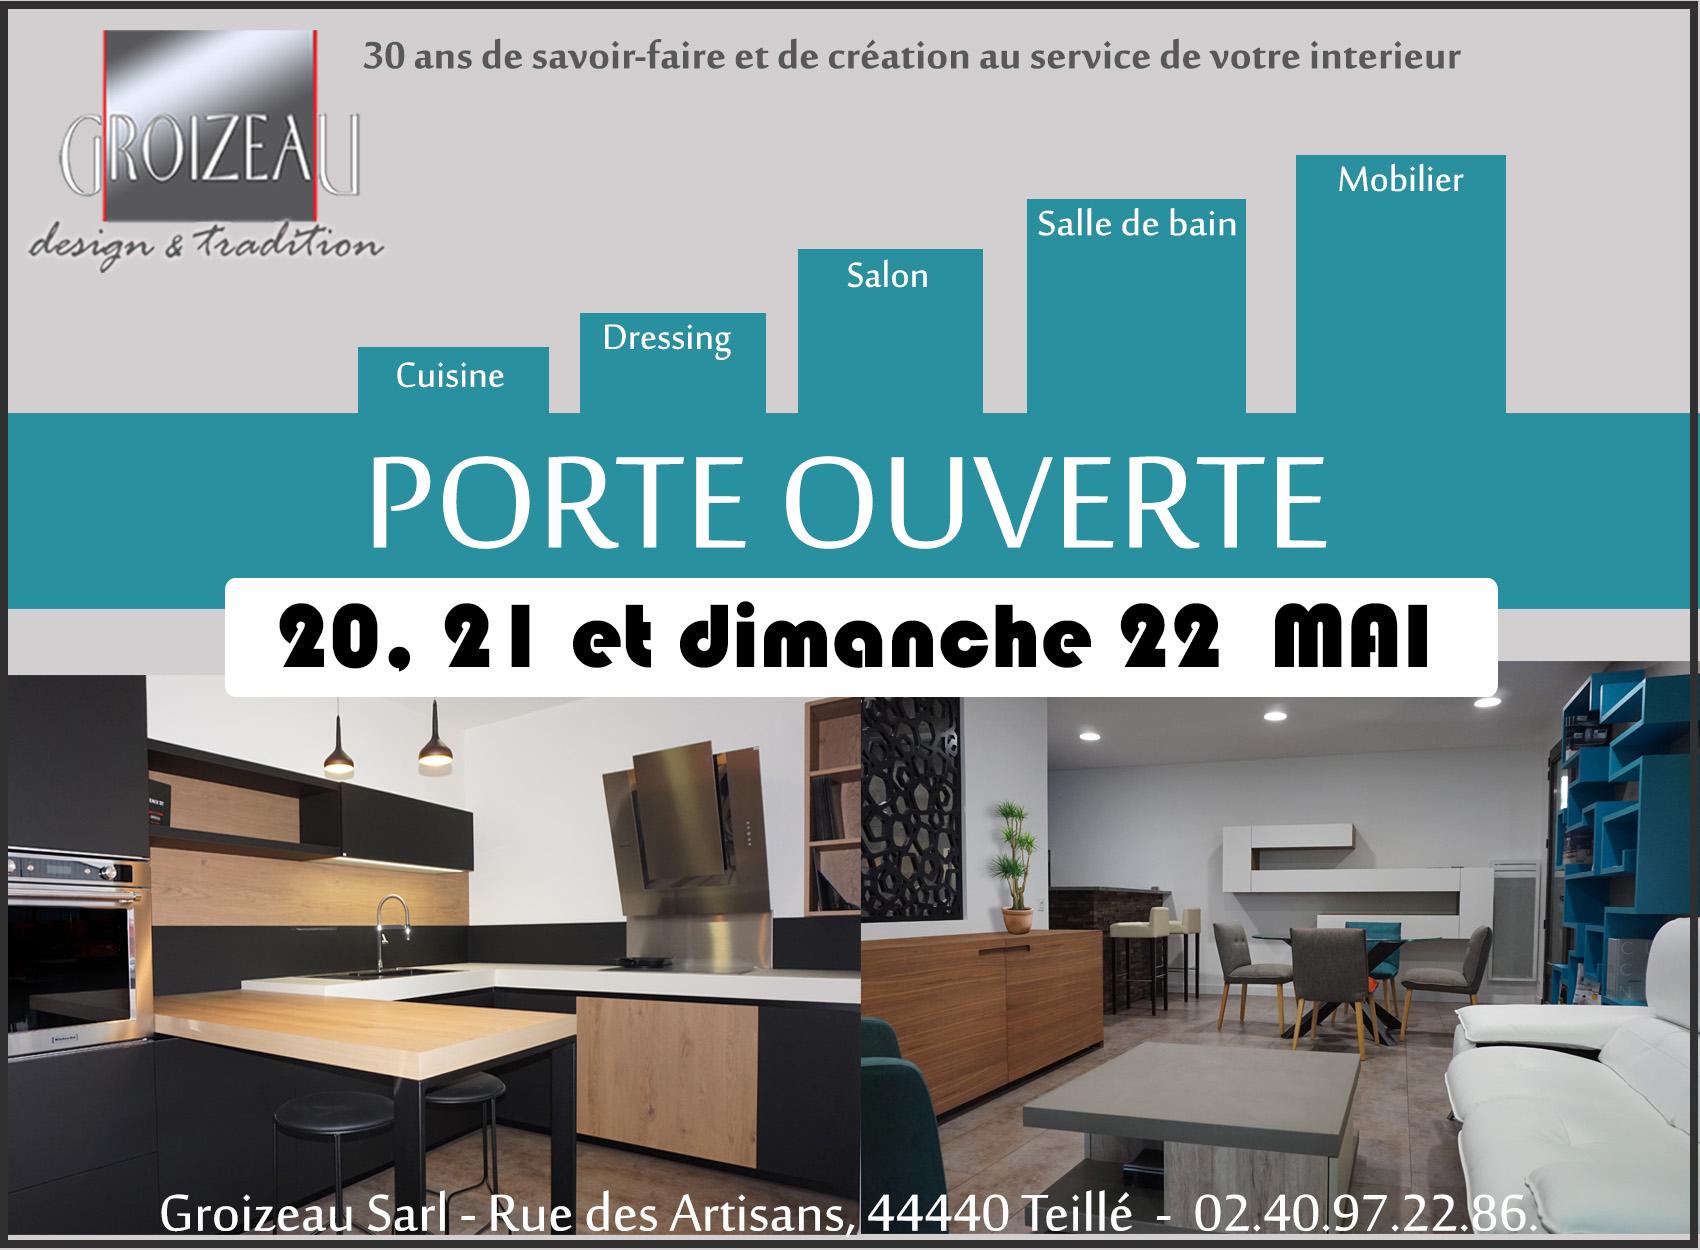 Showroom cuisine Teillé - atelier Groizeau invitation